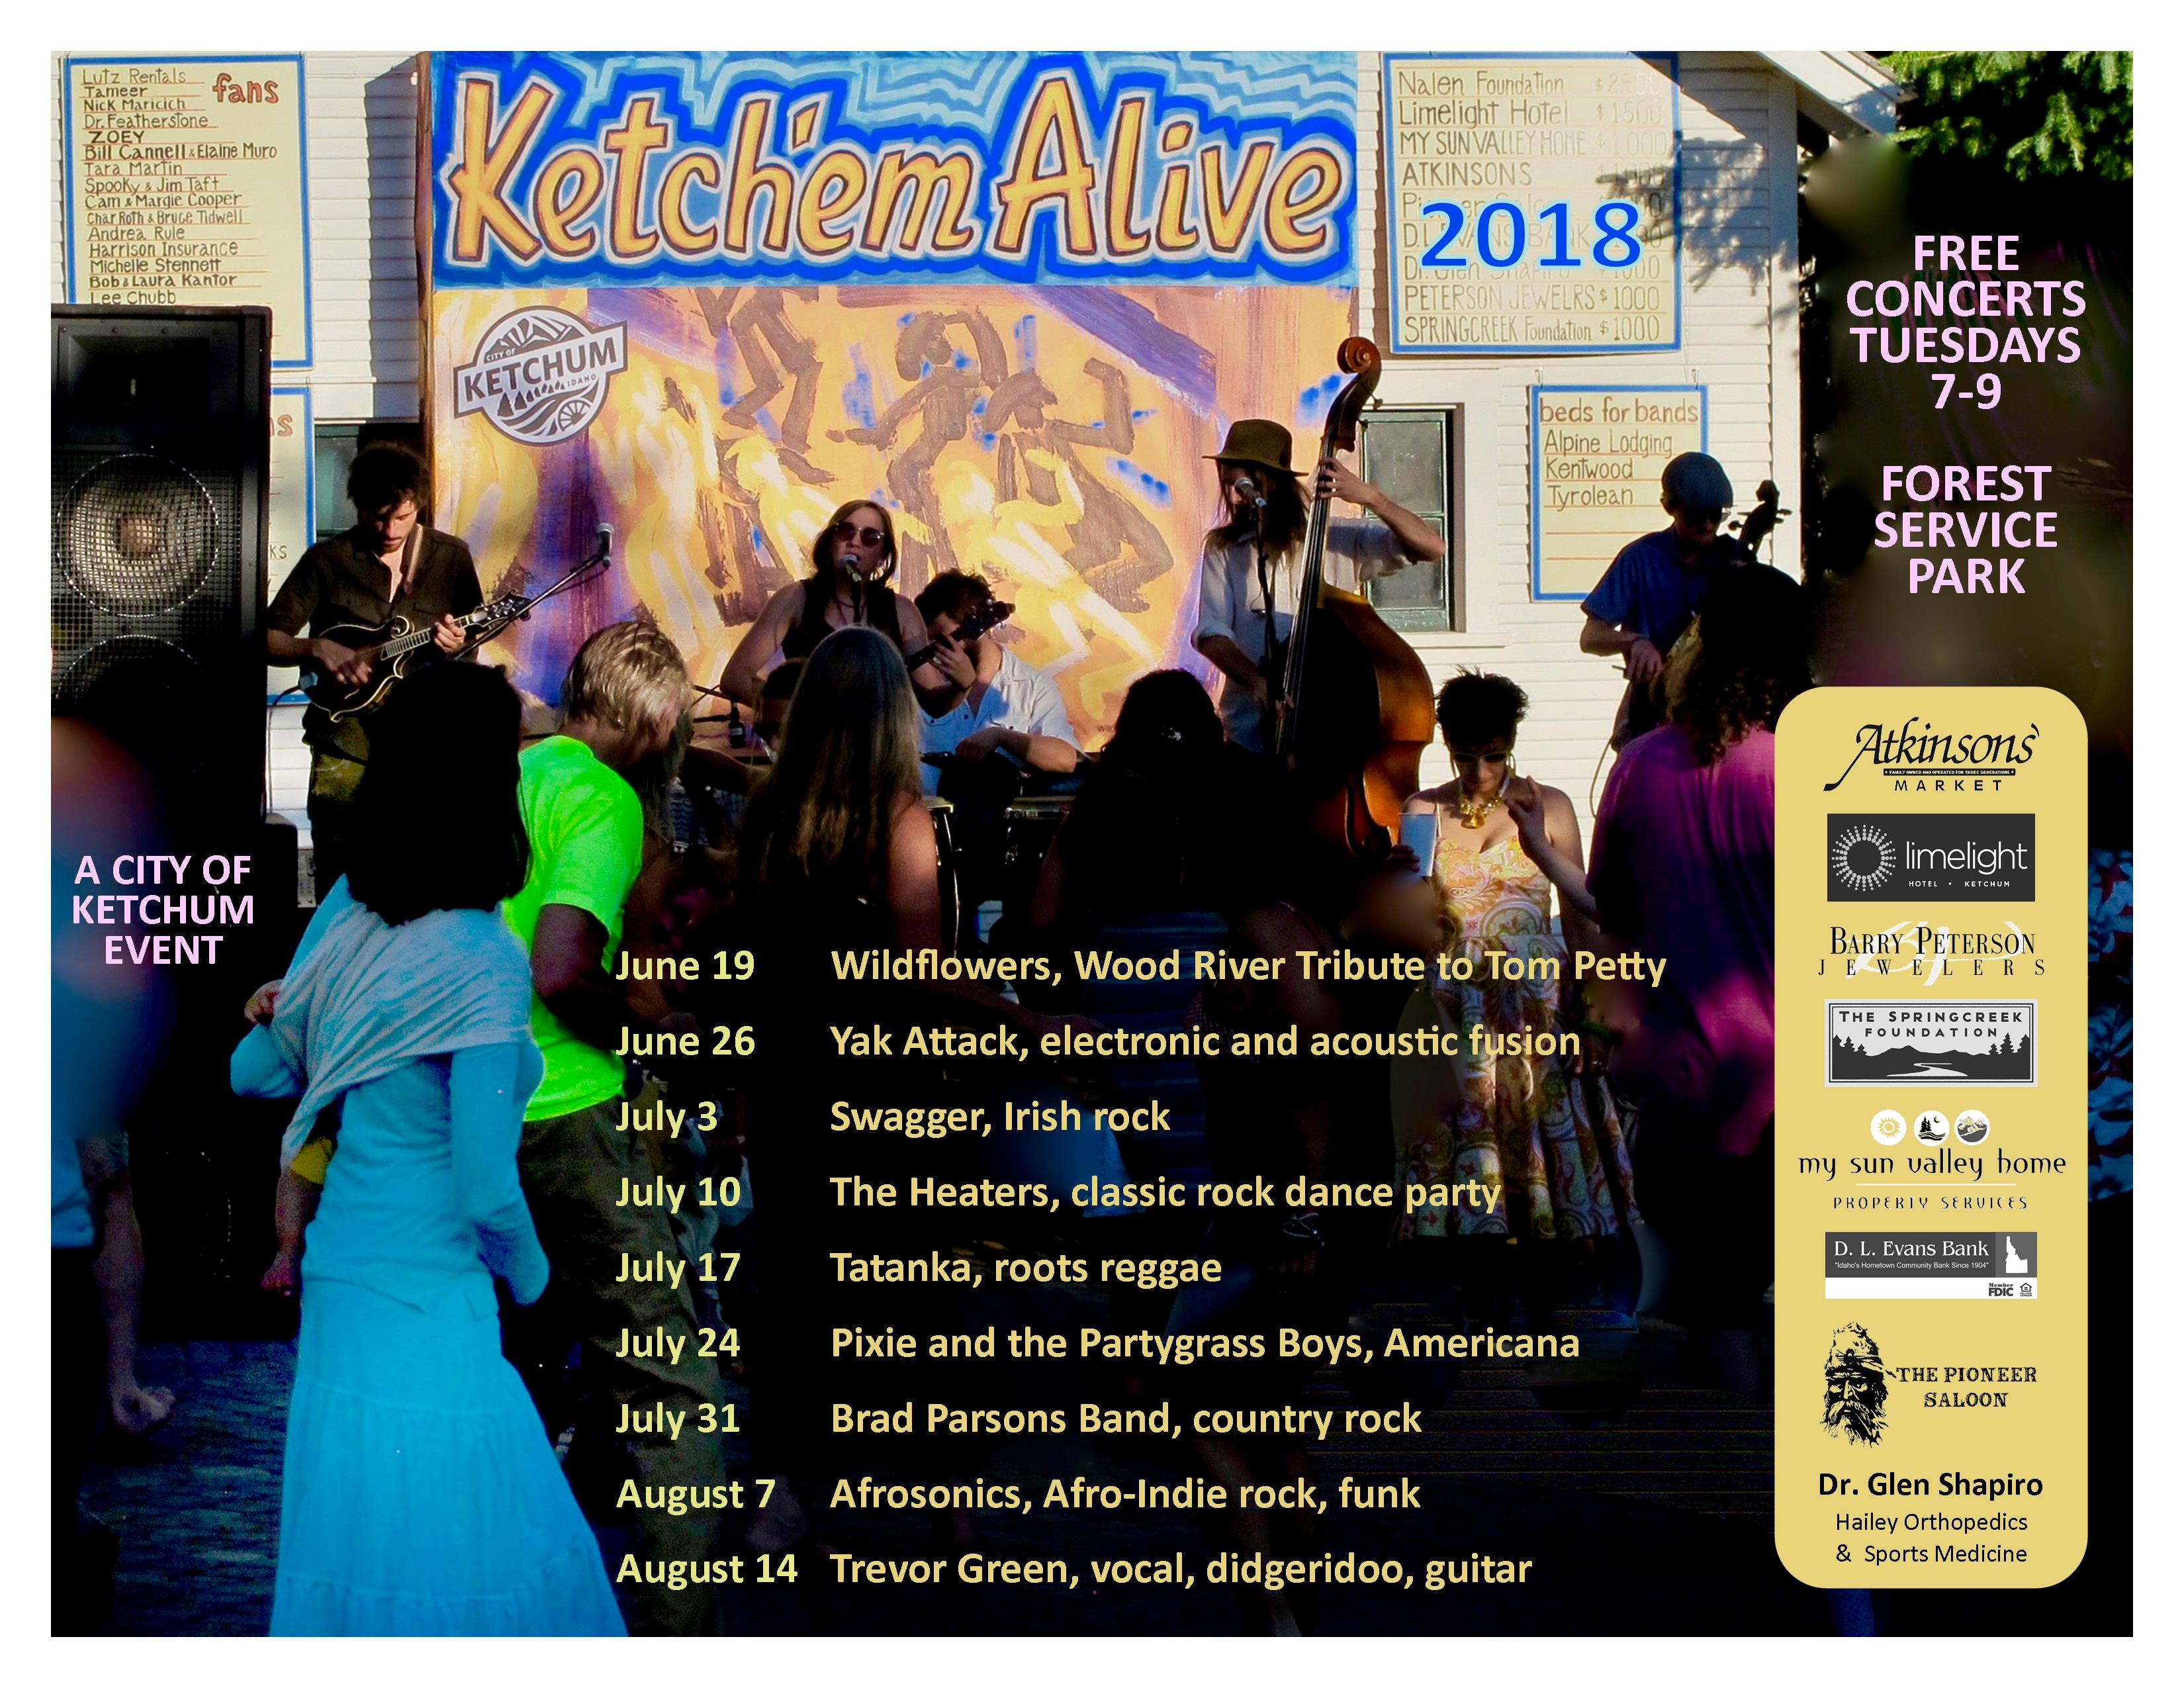 Ketch'Em Alive 2018 Summer Concert Schedule in Ketchum, Idaho